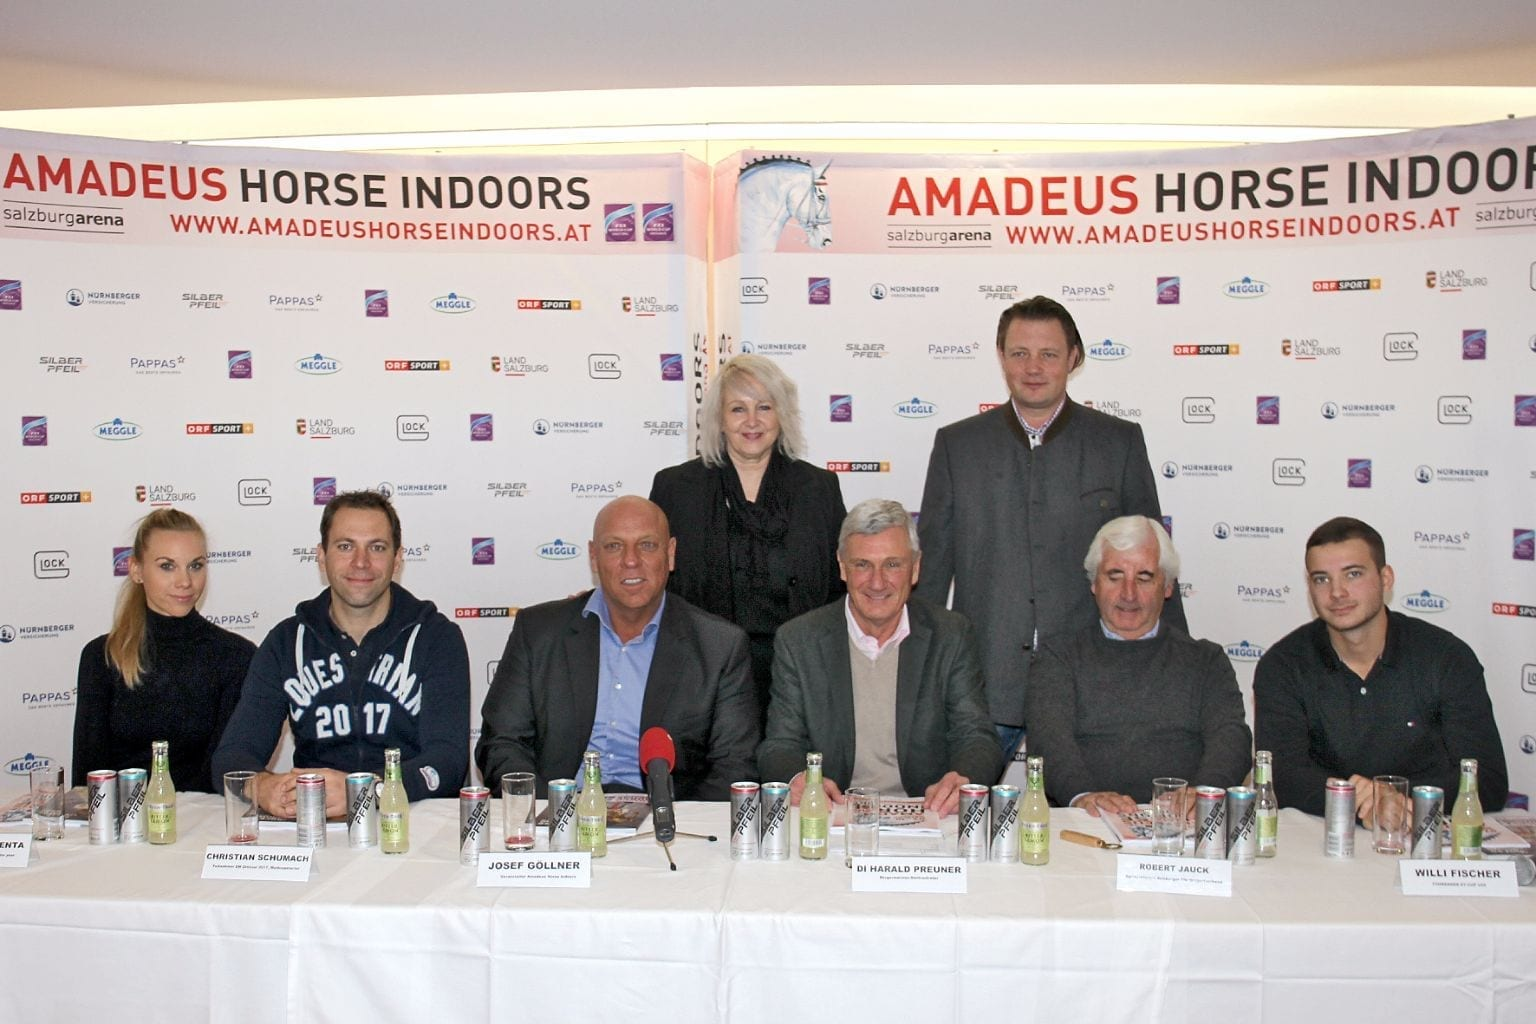 Von links nach rechts: Karoline Valenta, Christian Schuhmach, Josef Göllner, Ruth M. Büchlmann (hinten), DI Harald Preuner, Thomas Kreidl (hinten), Robert Jauck, Willi Fischer. © Amadeus Horse Indoors